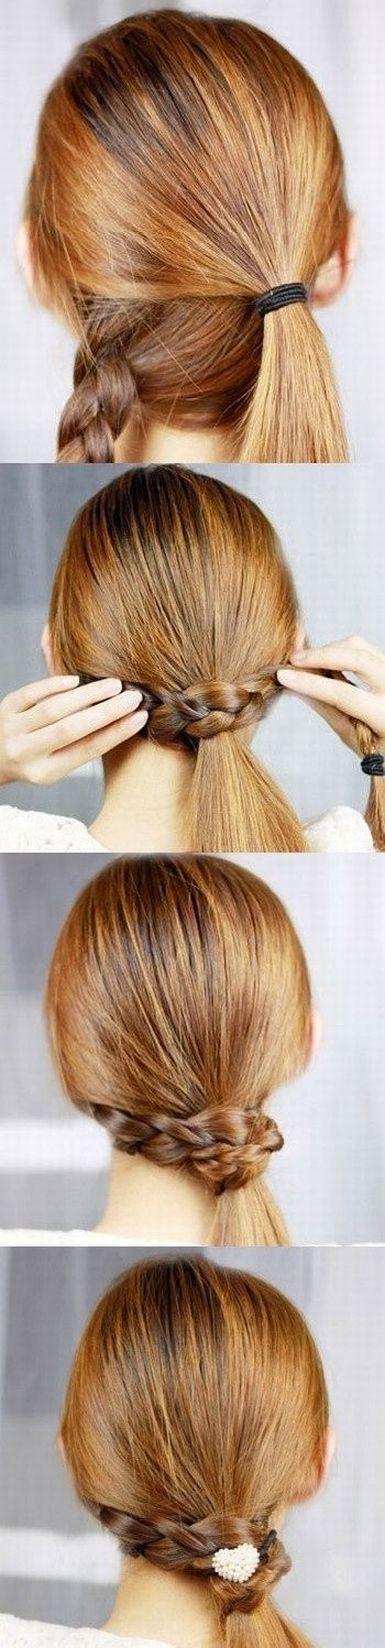 Hairstyle tutorial braids to the side !! Tuto coiffure les tresses à la coté !  http://www.pinterest.com/adisavoiaditrev/